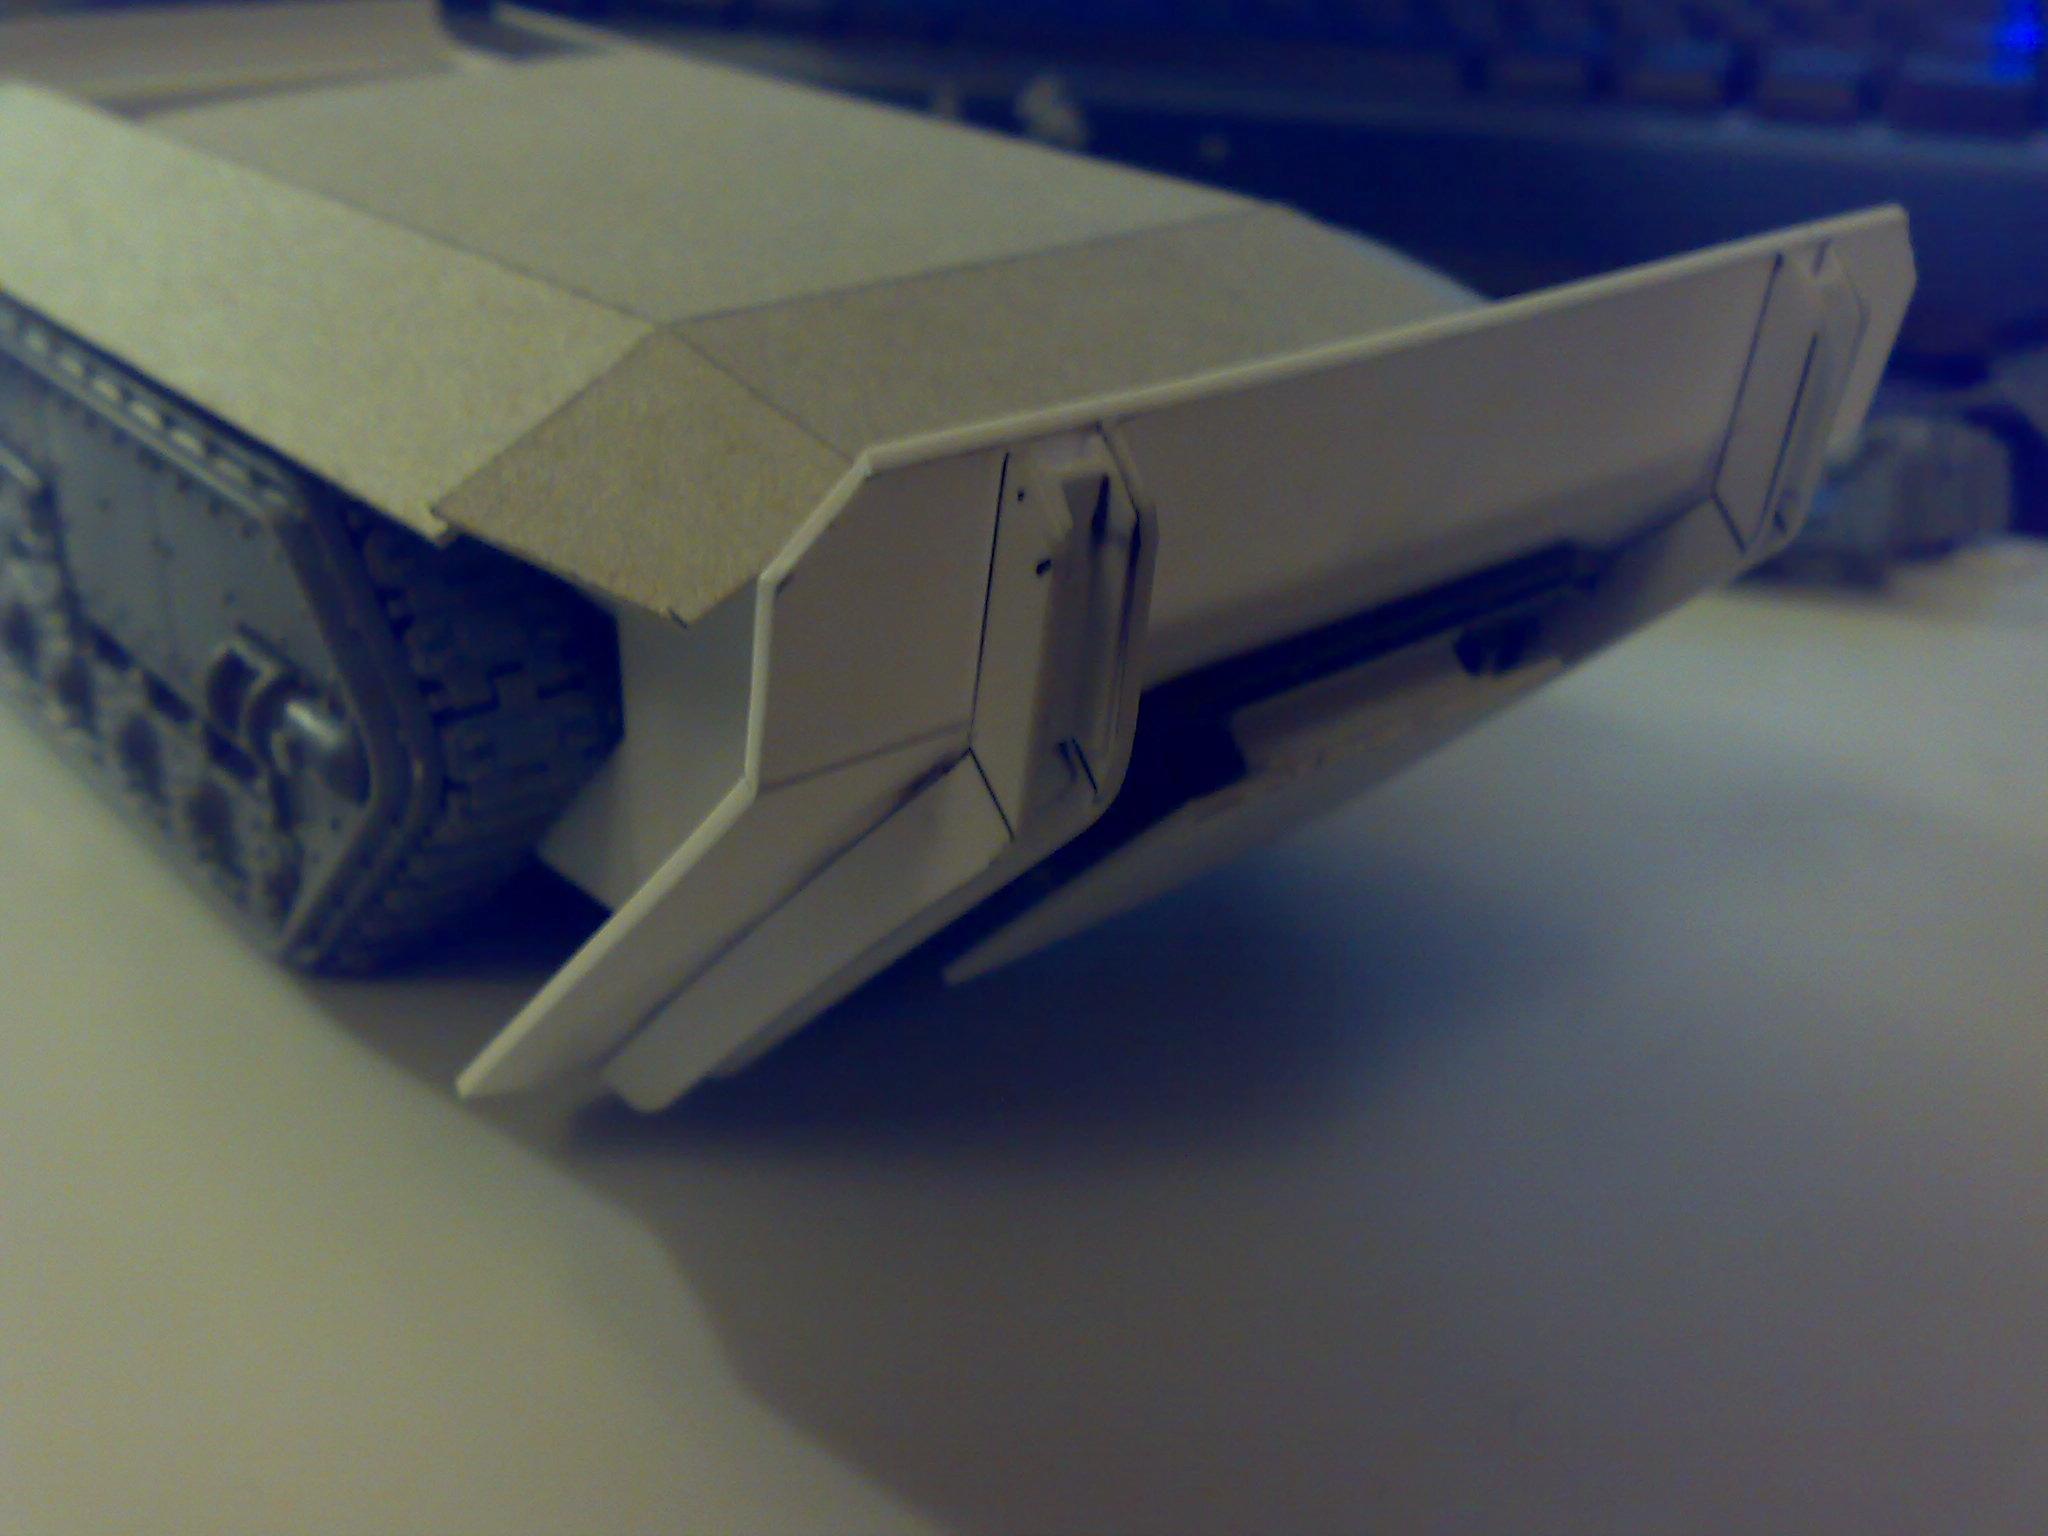 Chimera, Conversion, Imperial Guard, Vehicle, Warhammer 40,000, Work In Progress